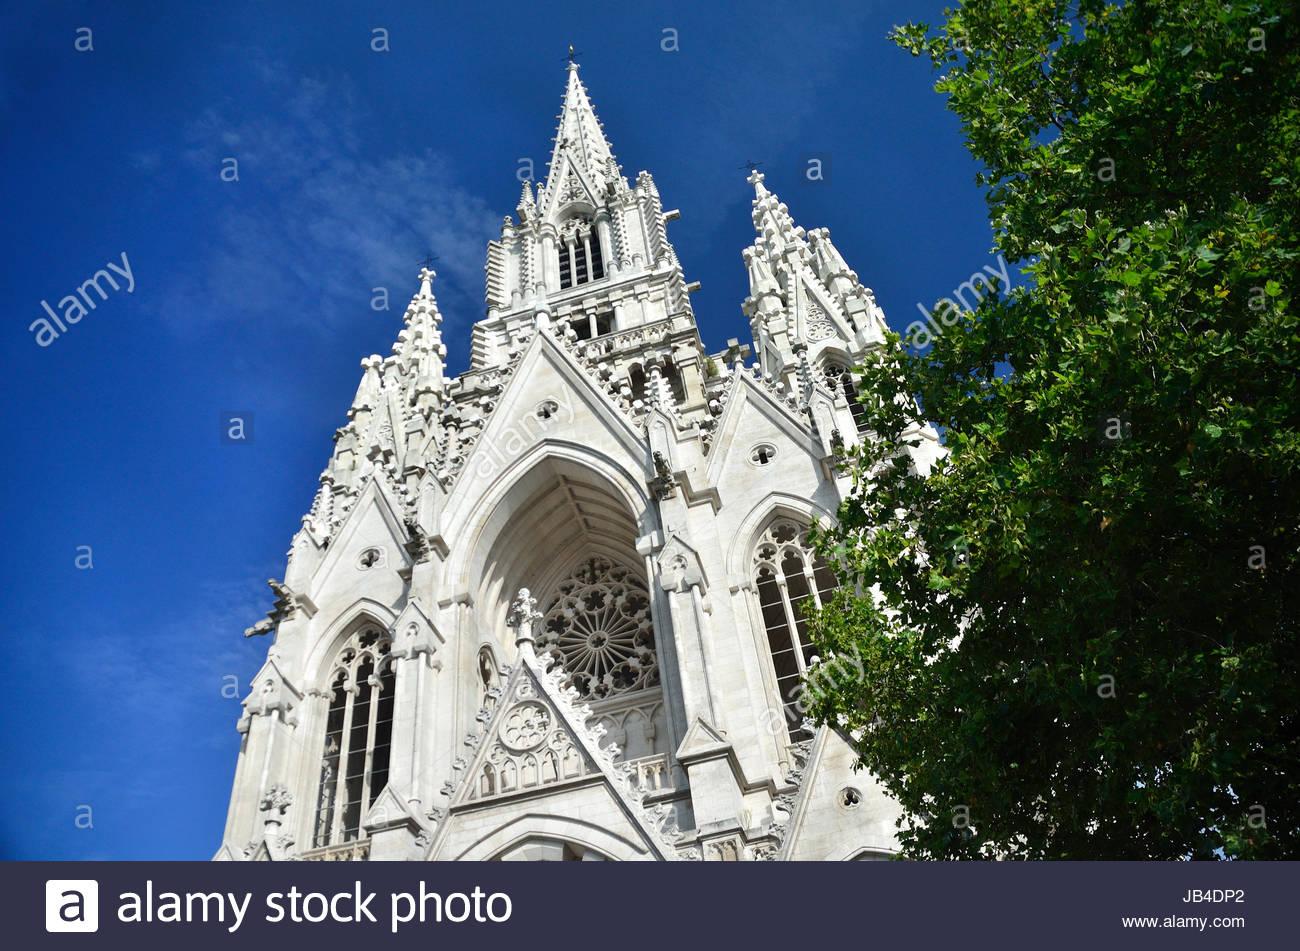 Weiße Kirche